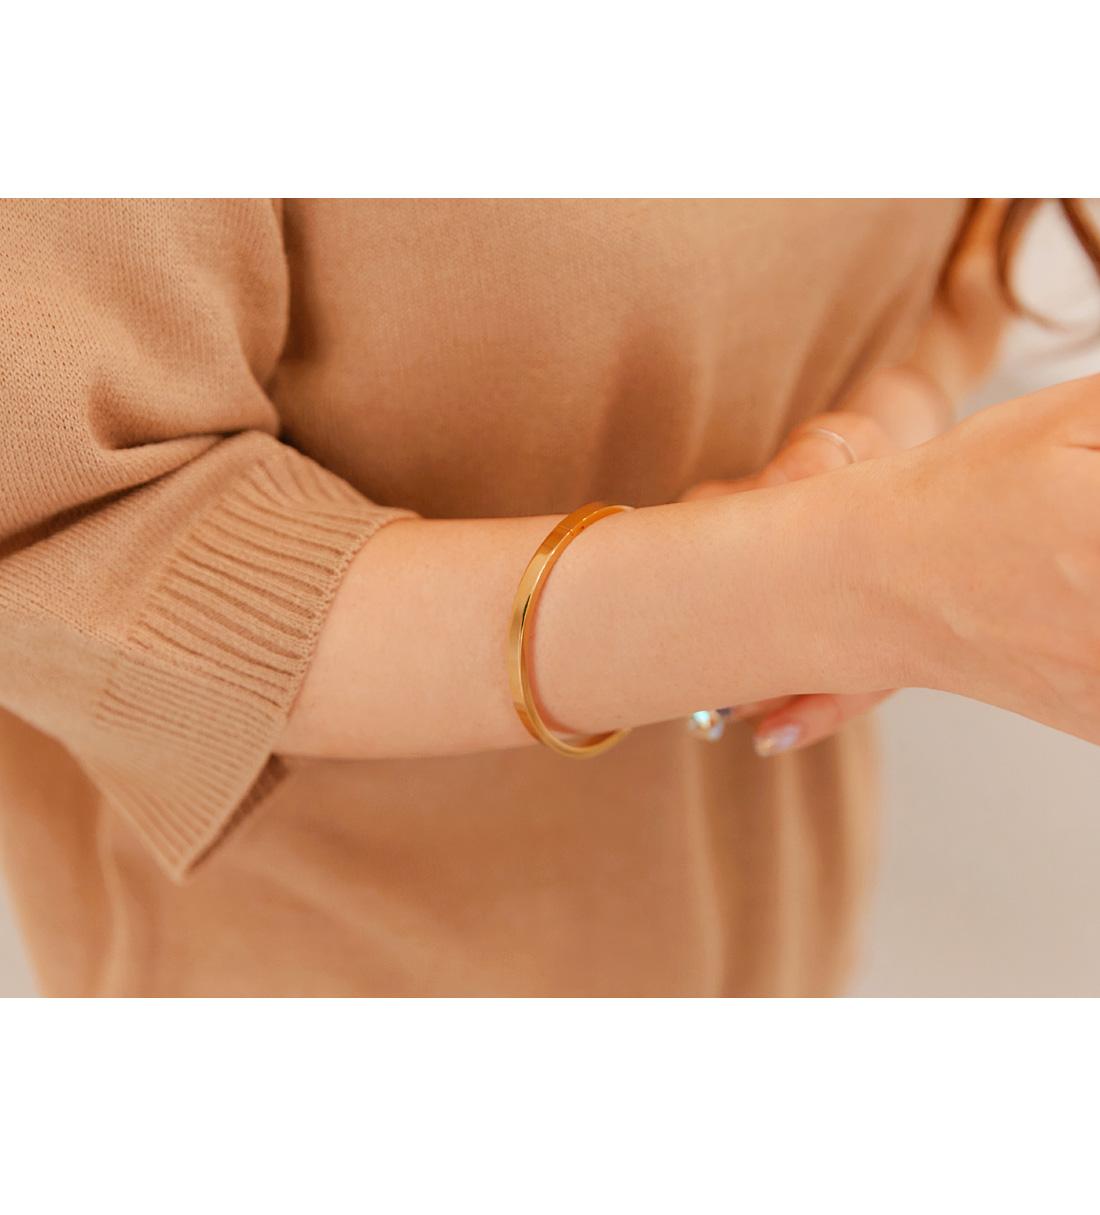 CANBLE ELLIPSE RING BRACELET